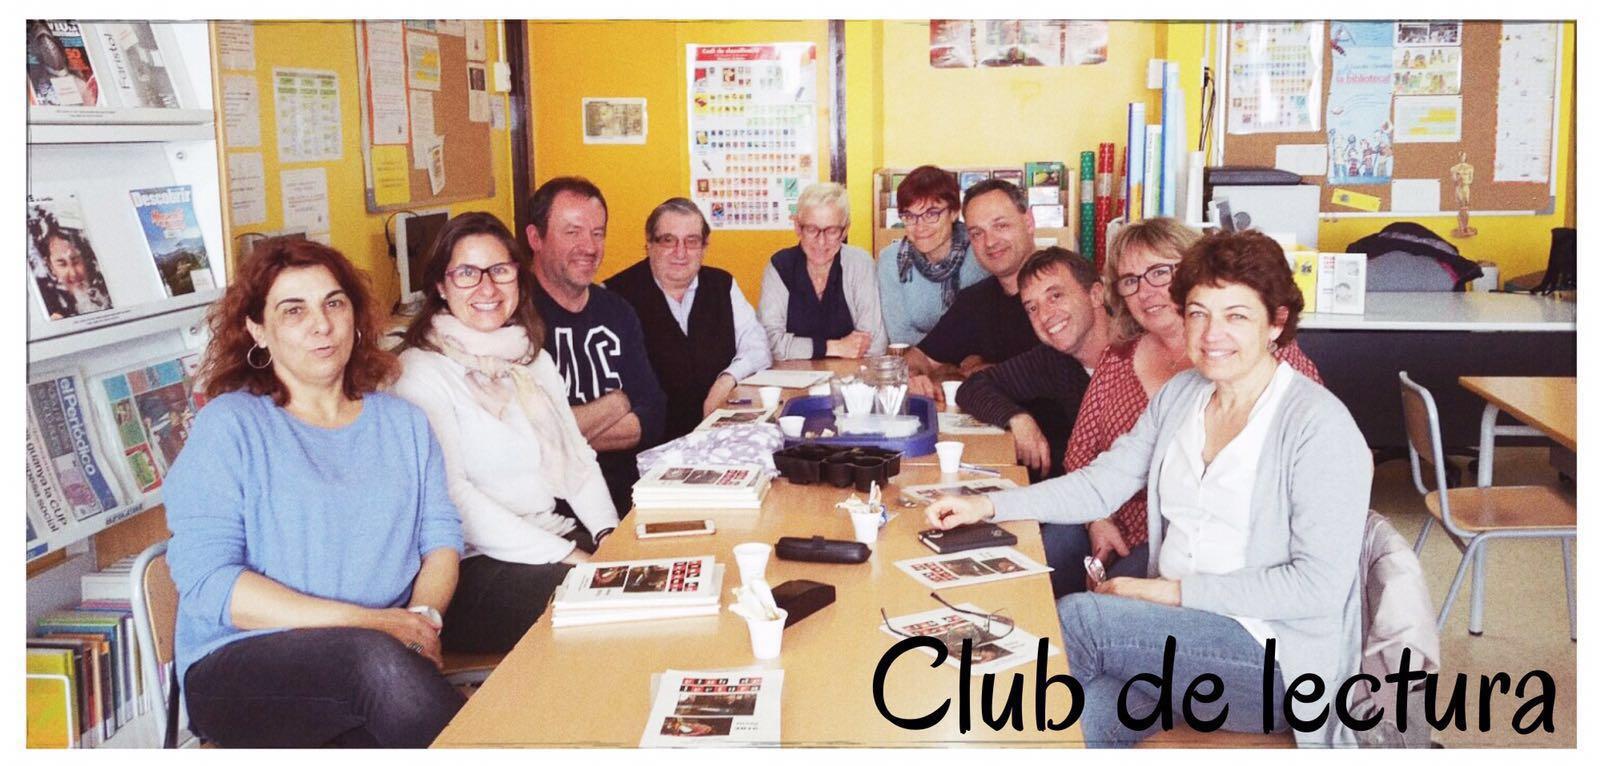 Club de lectura 2016